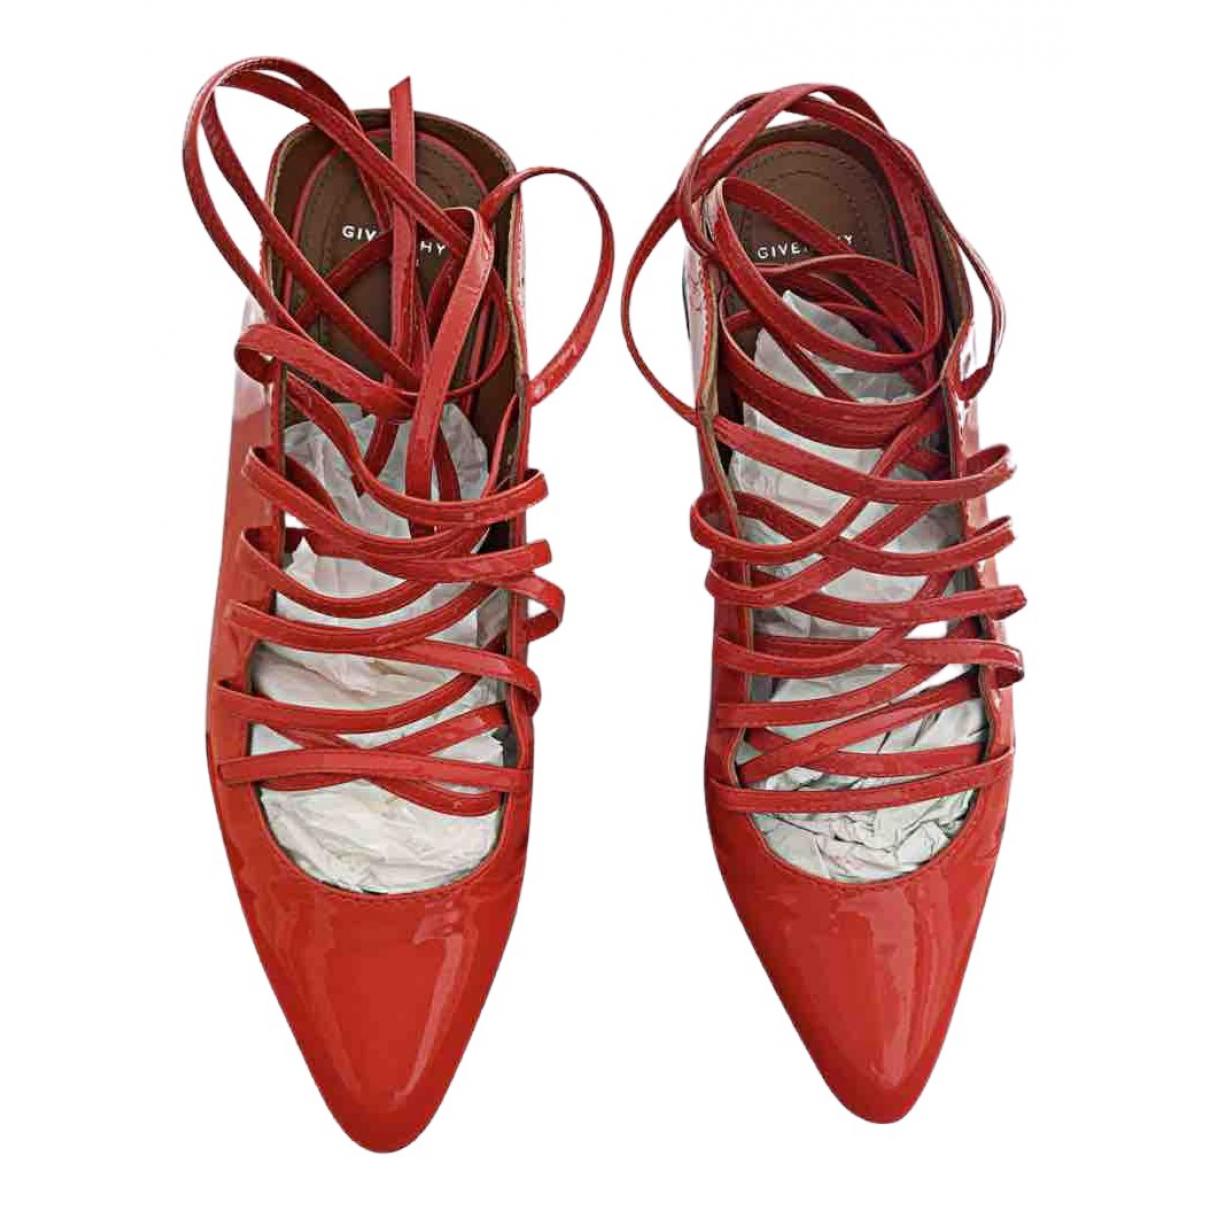 Bailarinas de Charol Givenchy